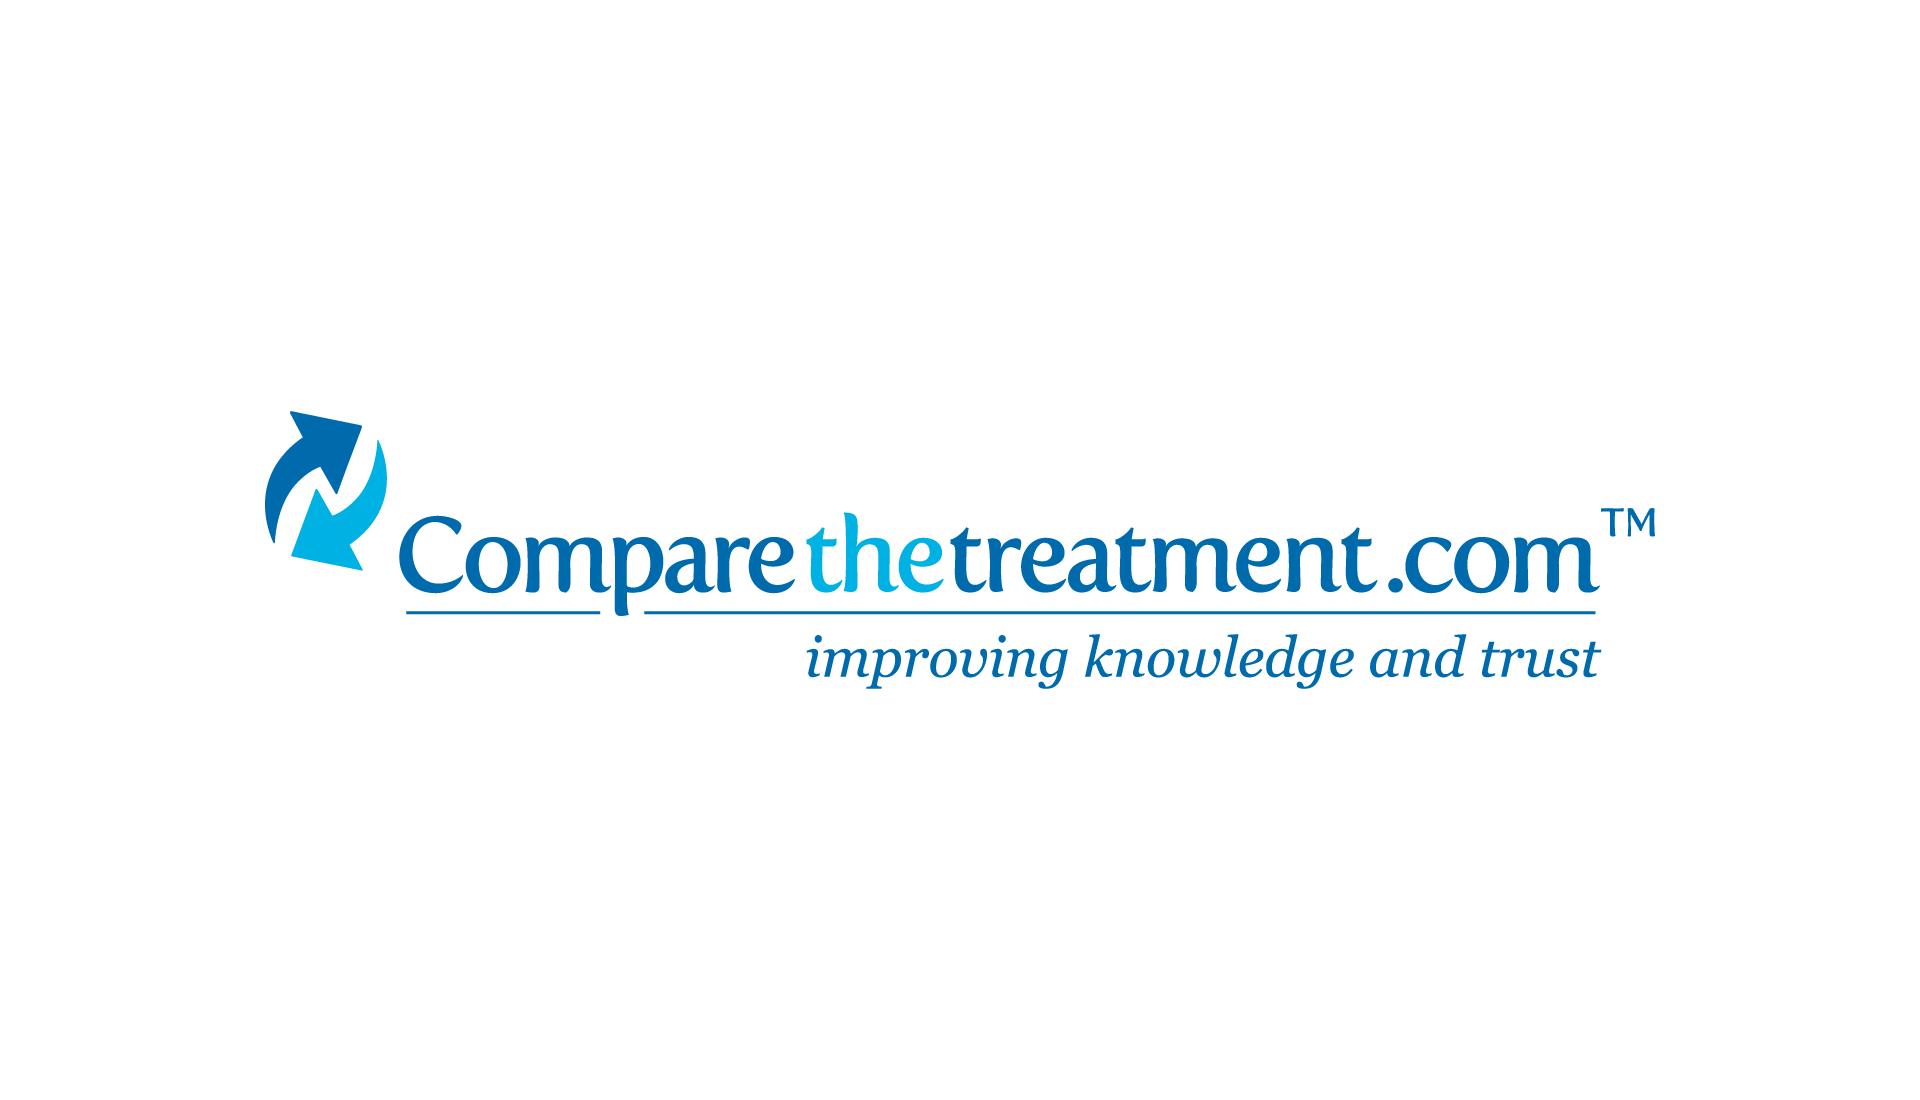 case study ctt logo